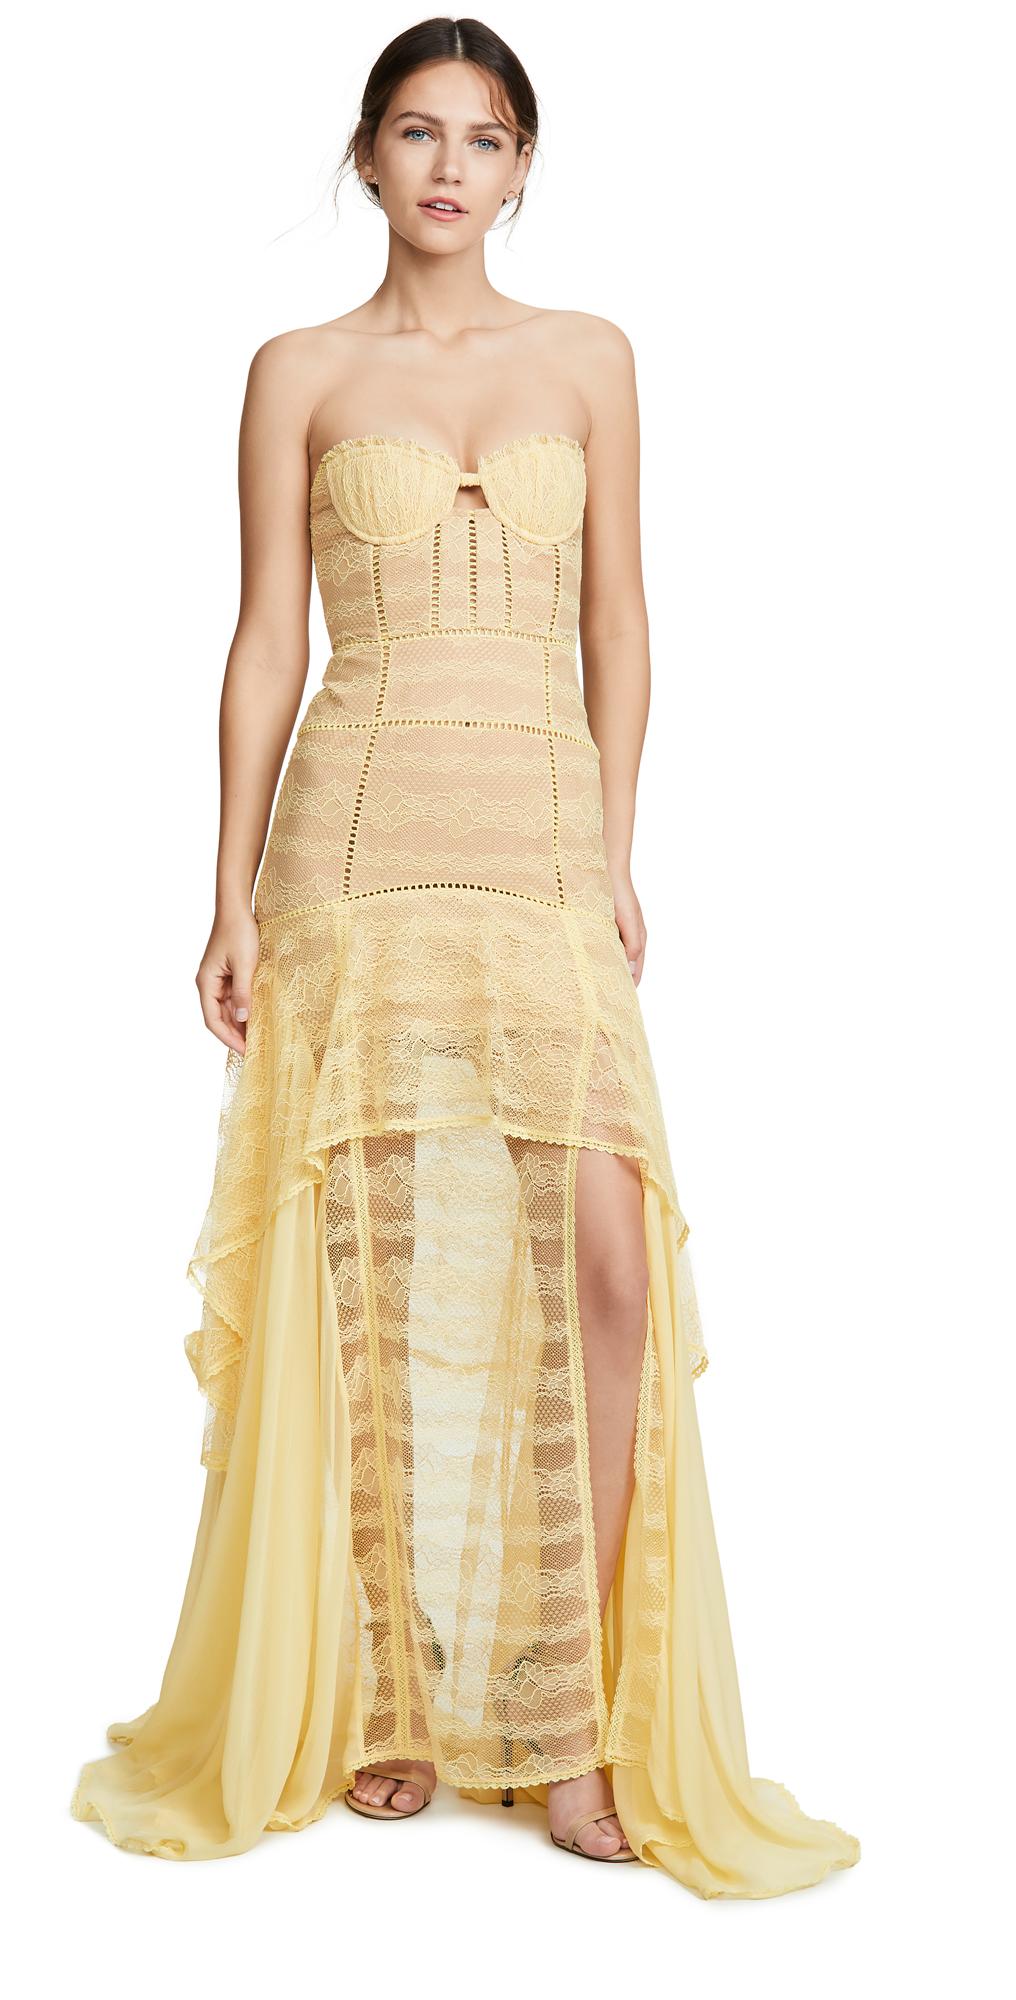 c7c6e3e601cb Jonathan Simkhai Embroidered Chiffon Lace Bustier Gown | SHOPBOP